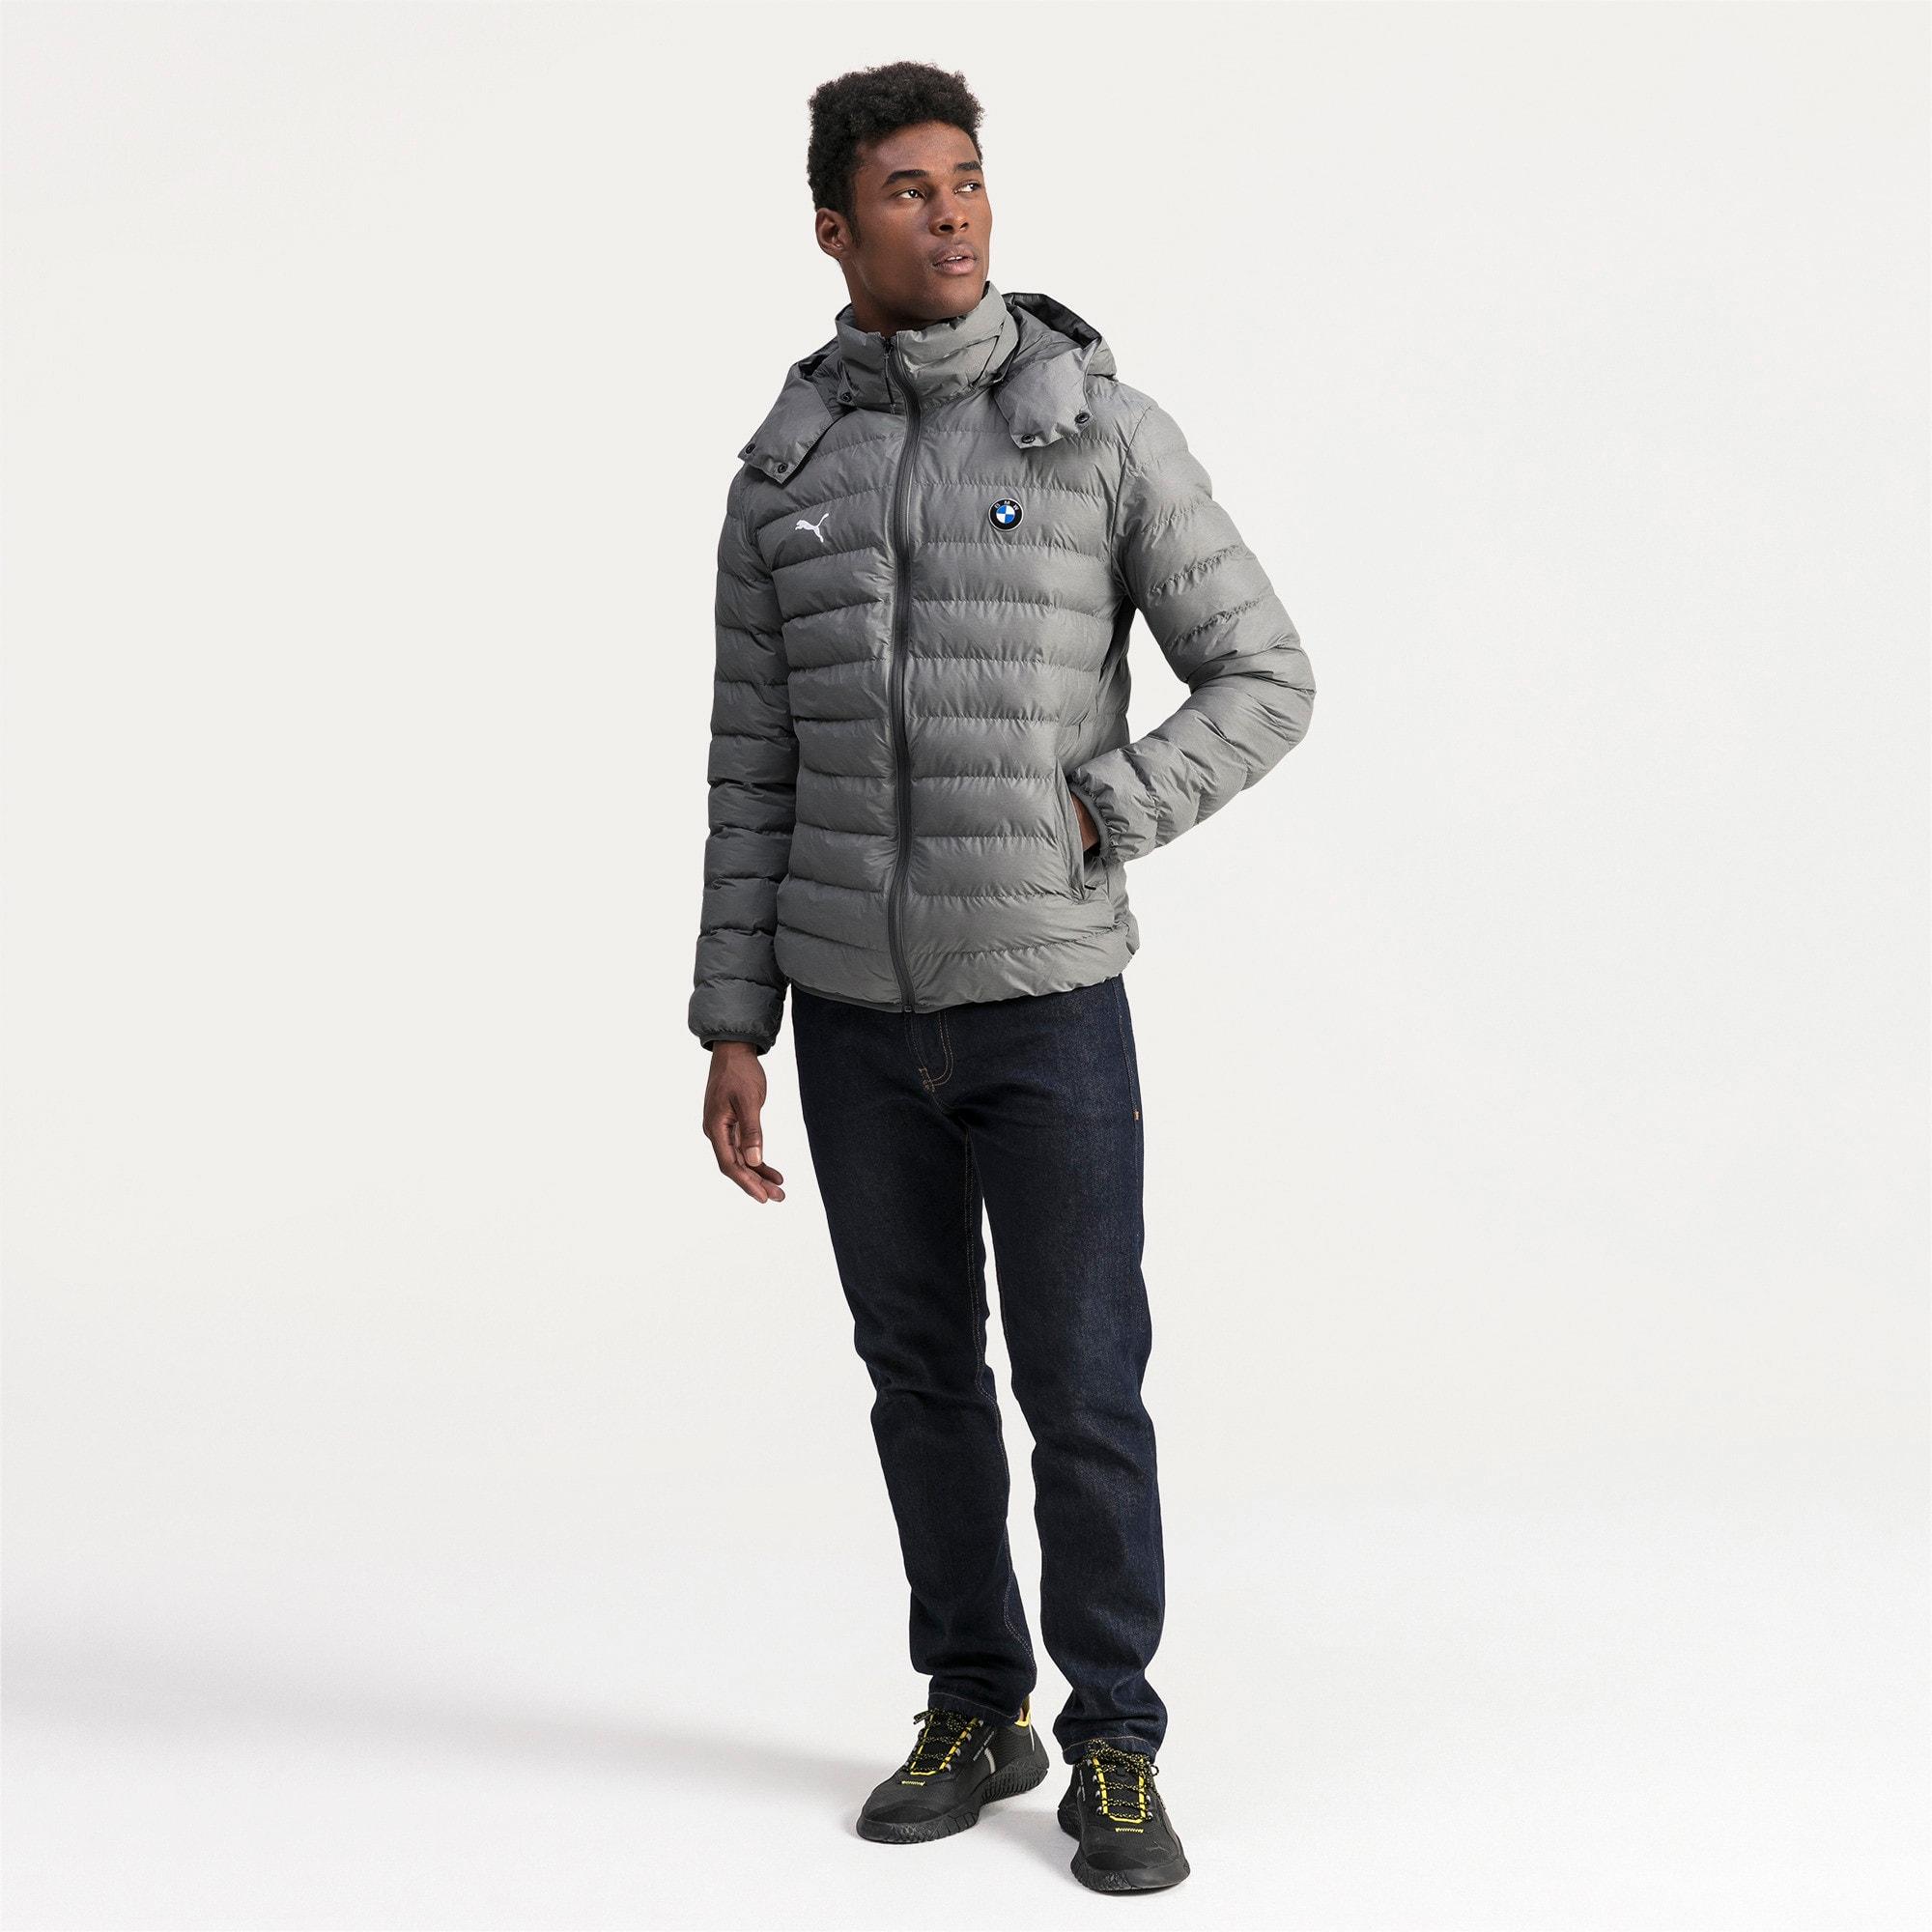 Thumbnail 3 of BMW Motorsport Eco PackLite Men's Jacket, Medium Gray Heather, medium